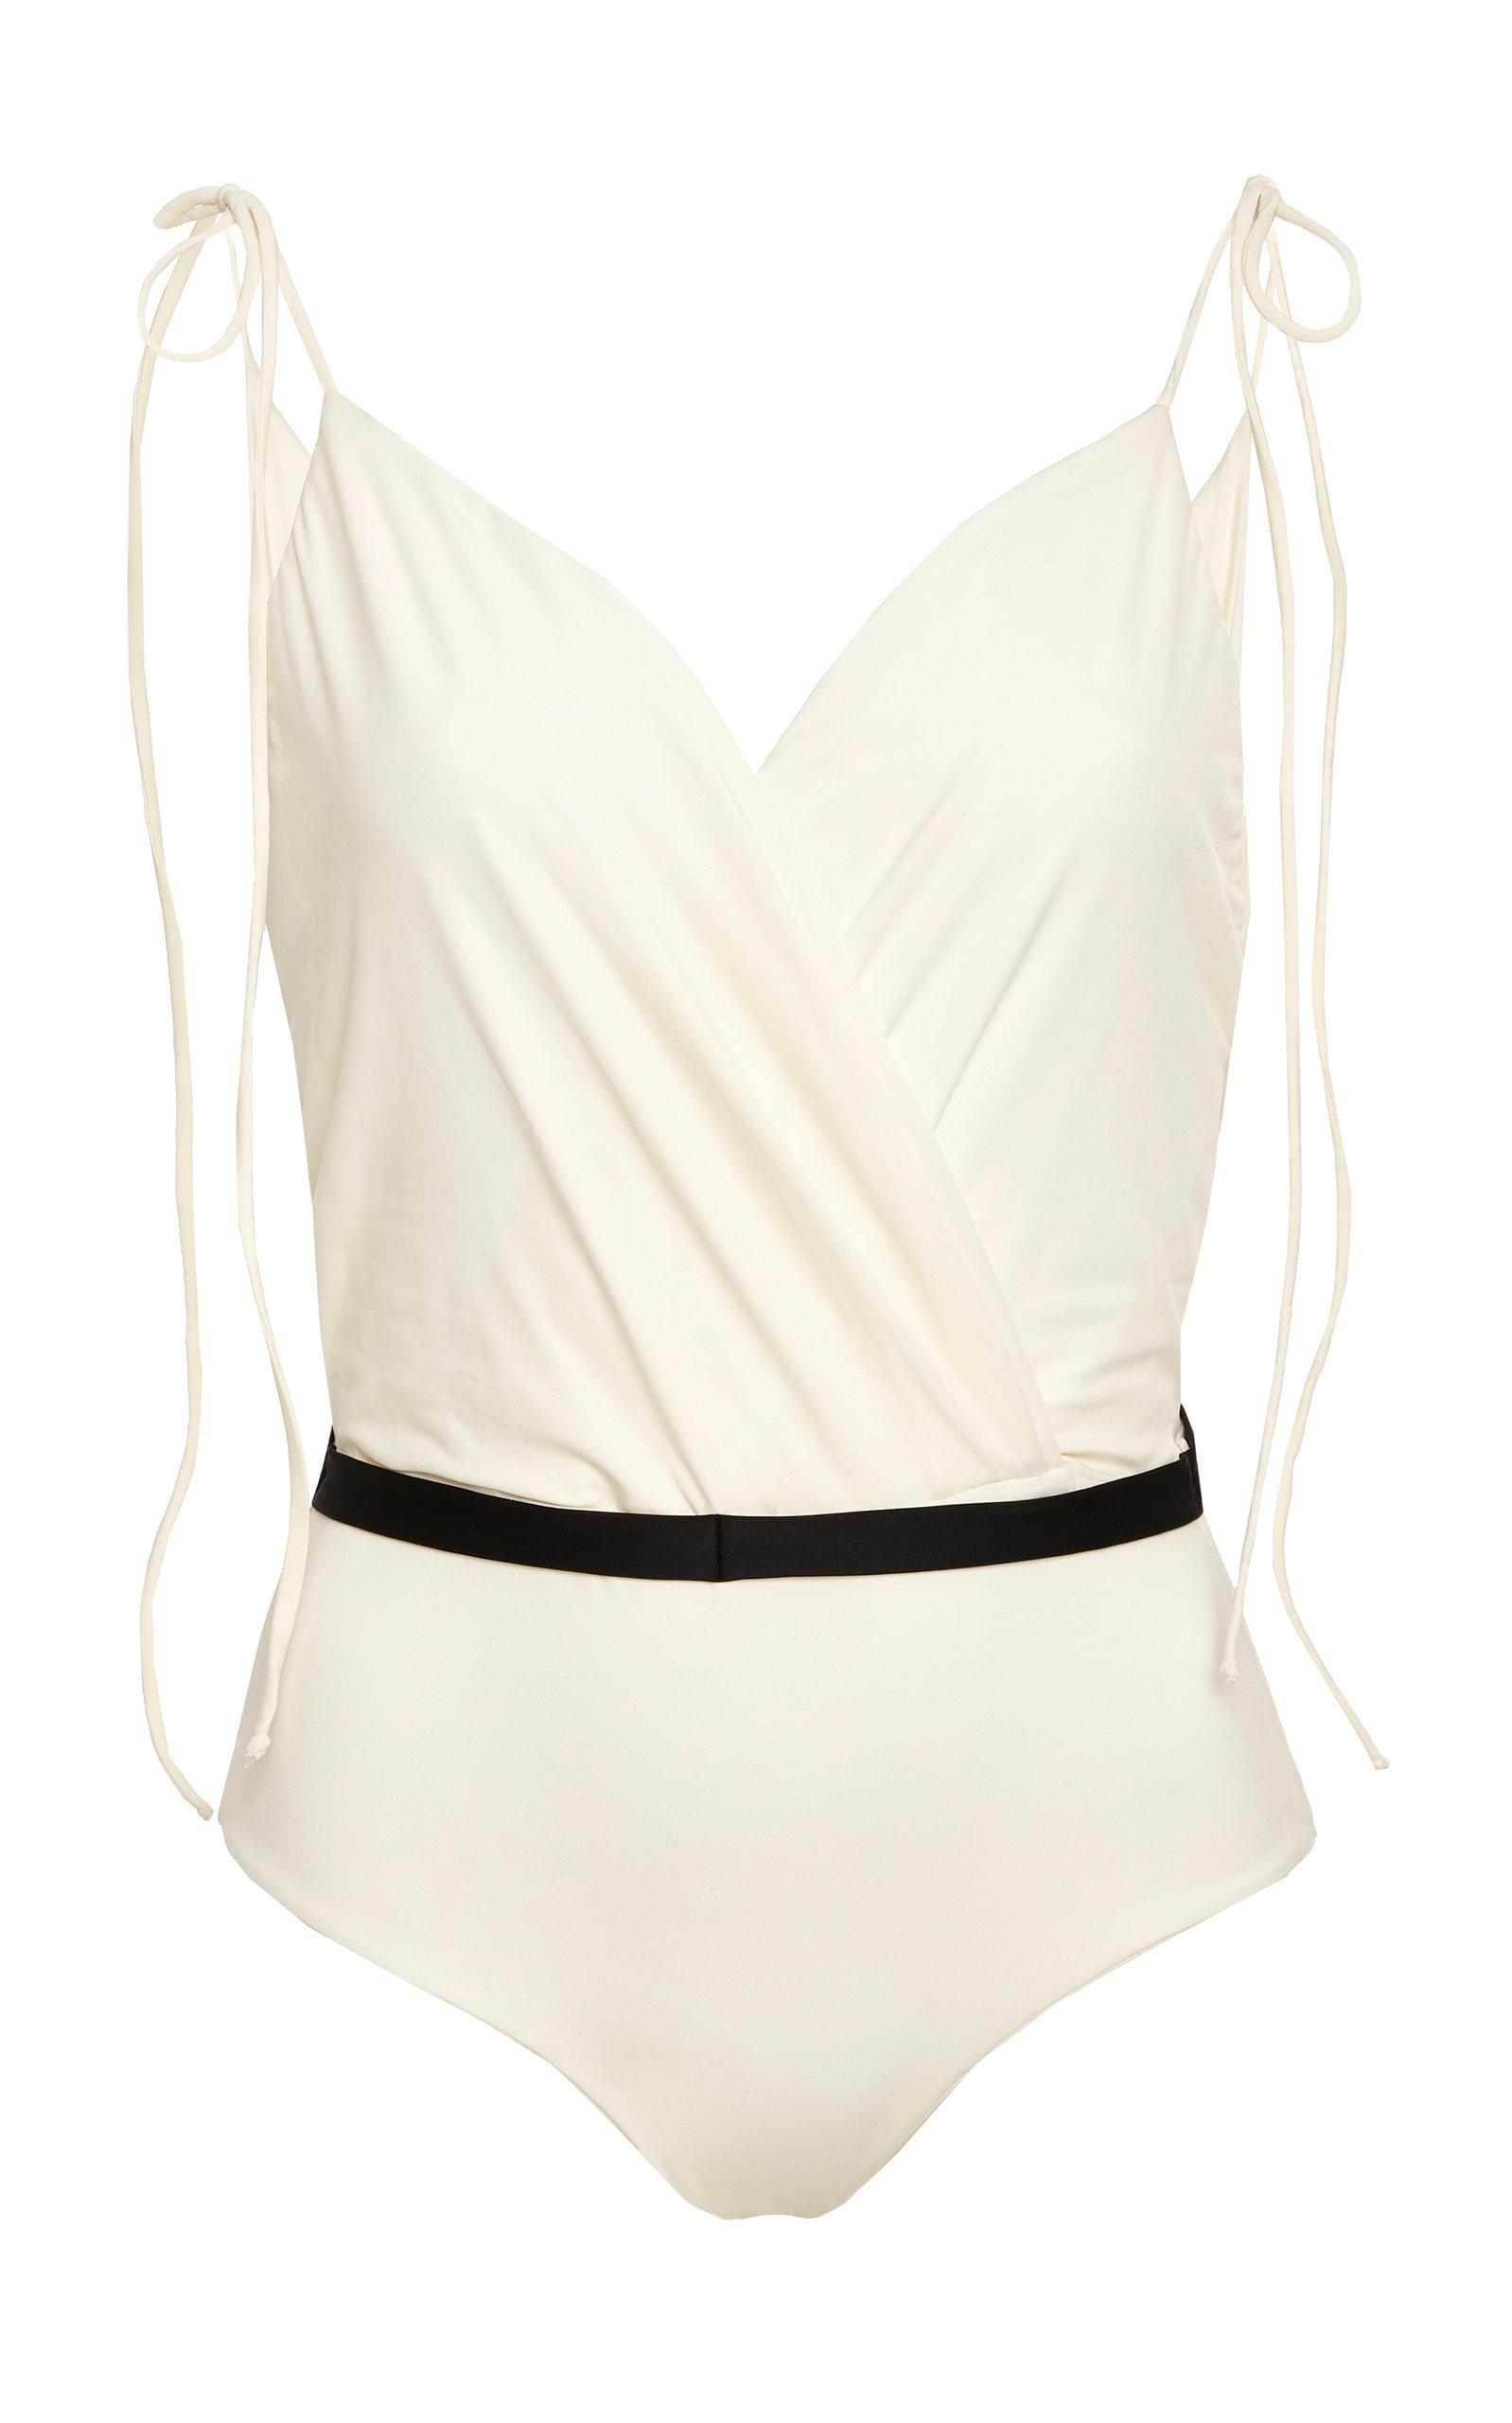 4ba2d3092a Johanna Ortiz M'o Exclusive La Perla Ruffle Swimsuit in White - Lyst